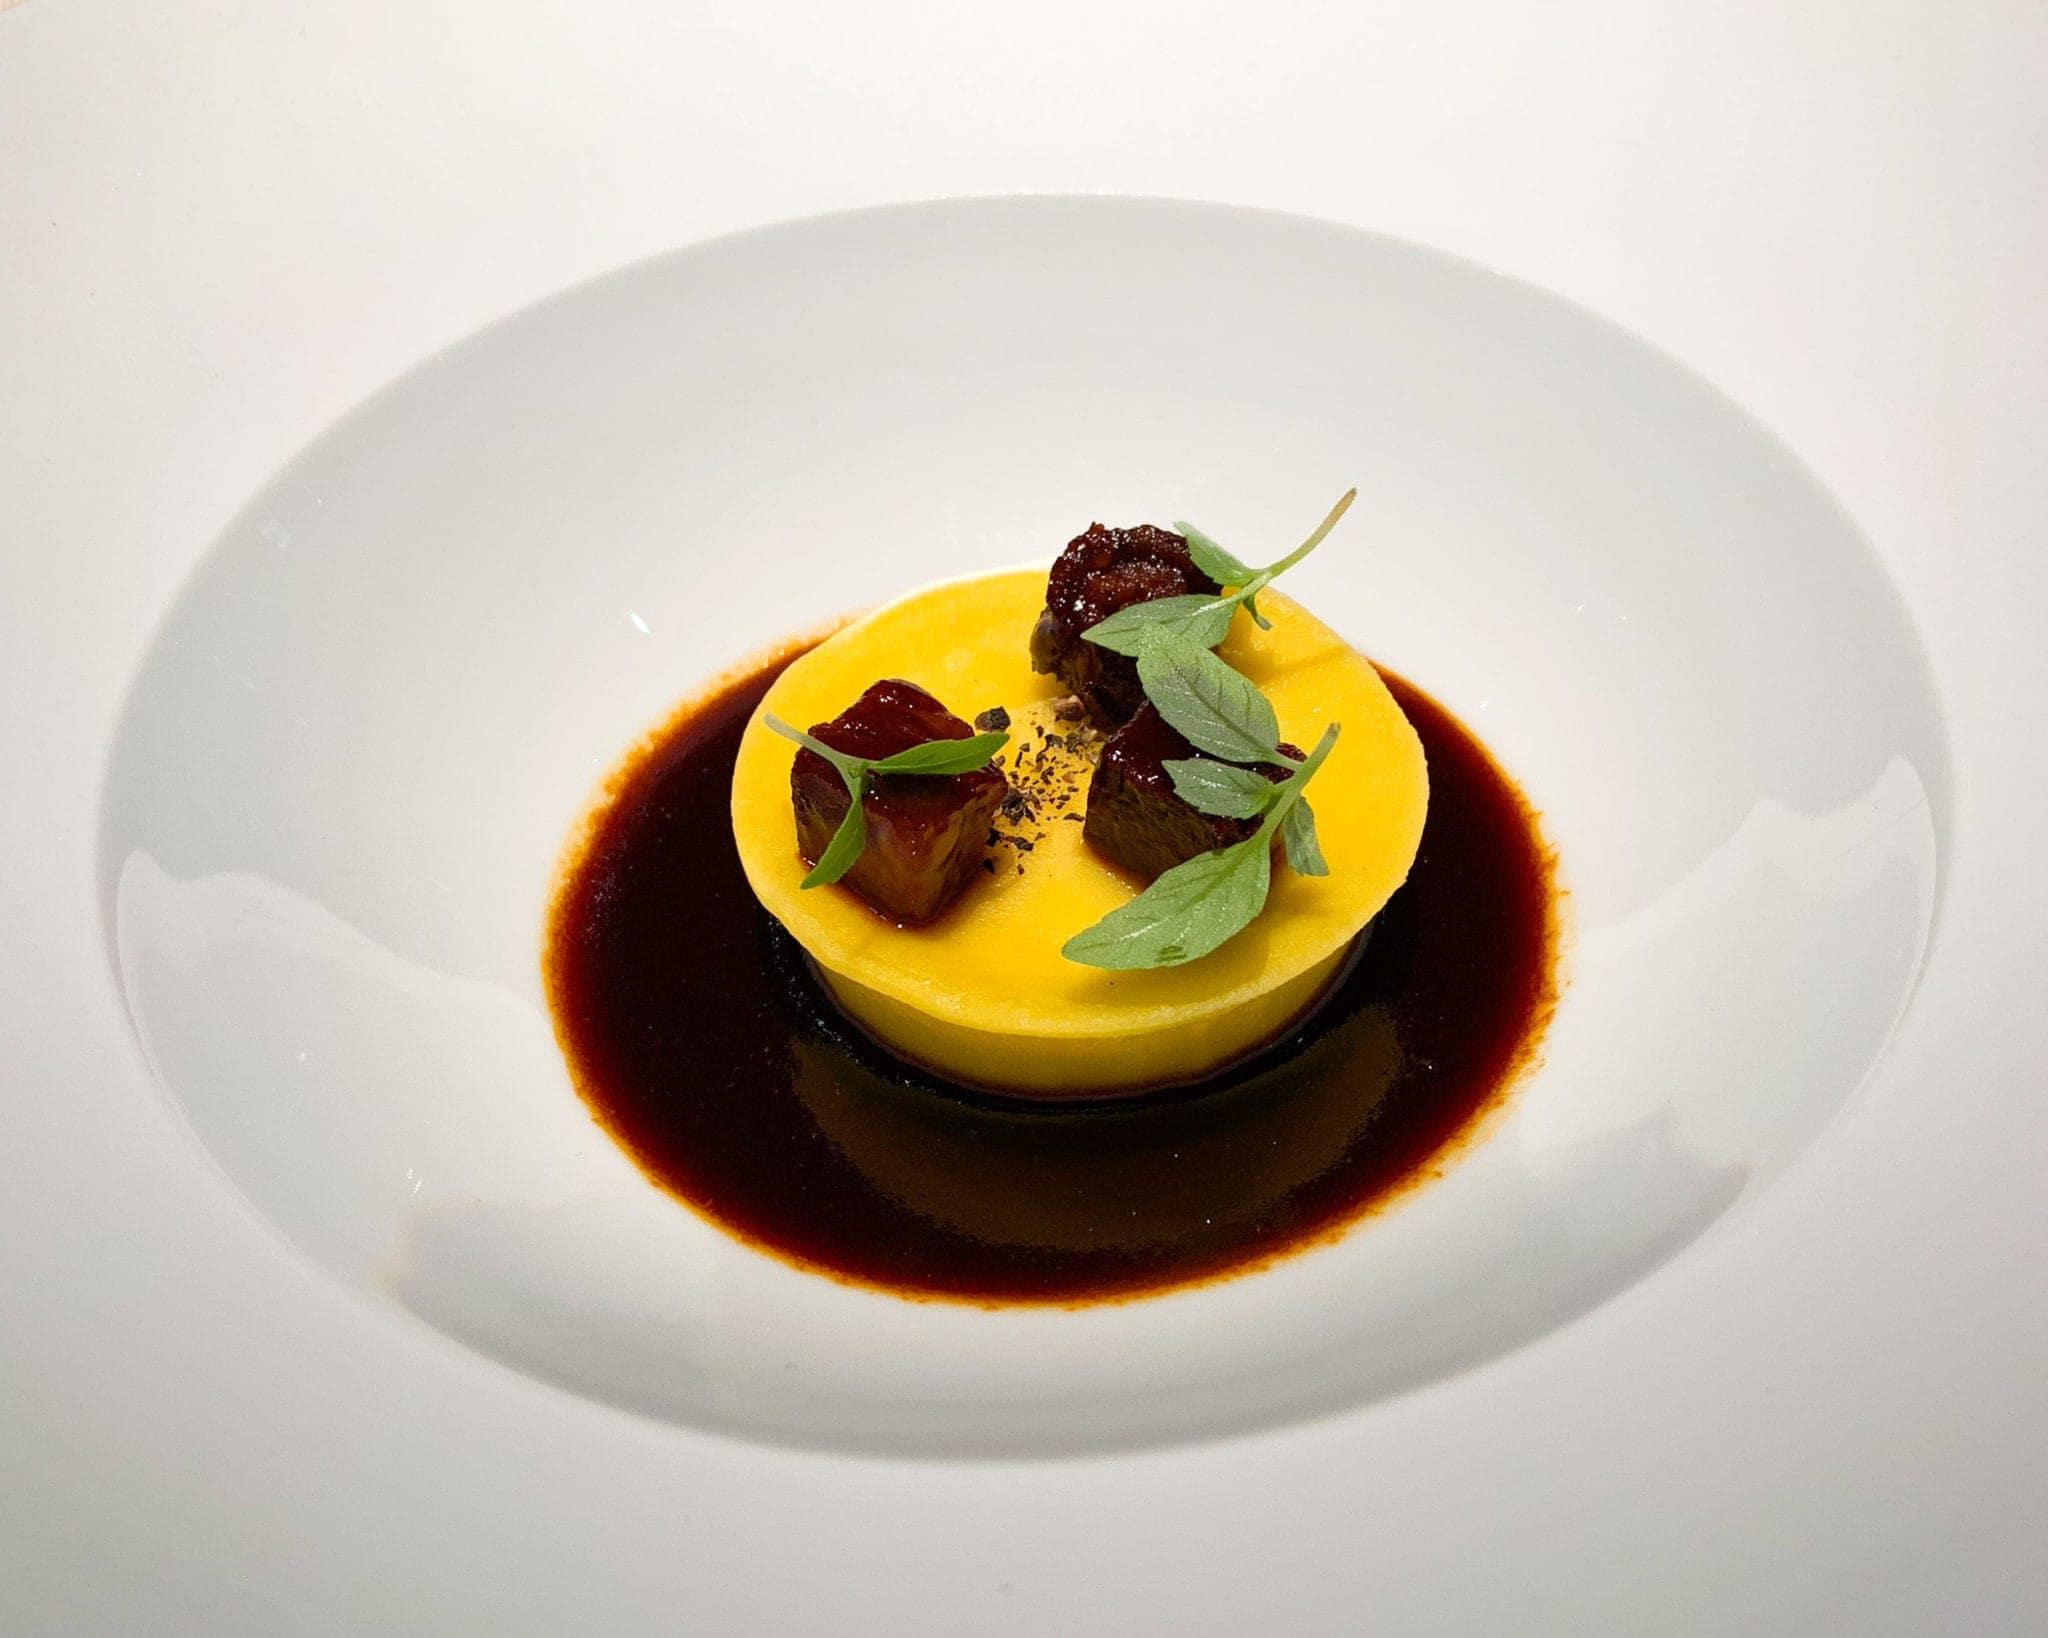 Vun Andrea Aprea 2 Star Michelin Dinner In Milan Feastio